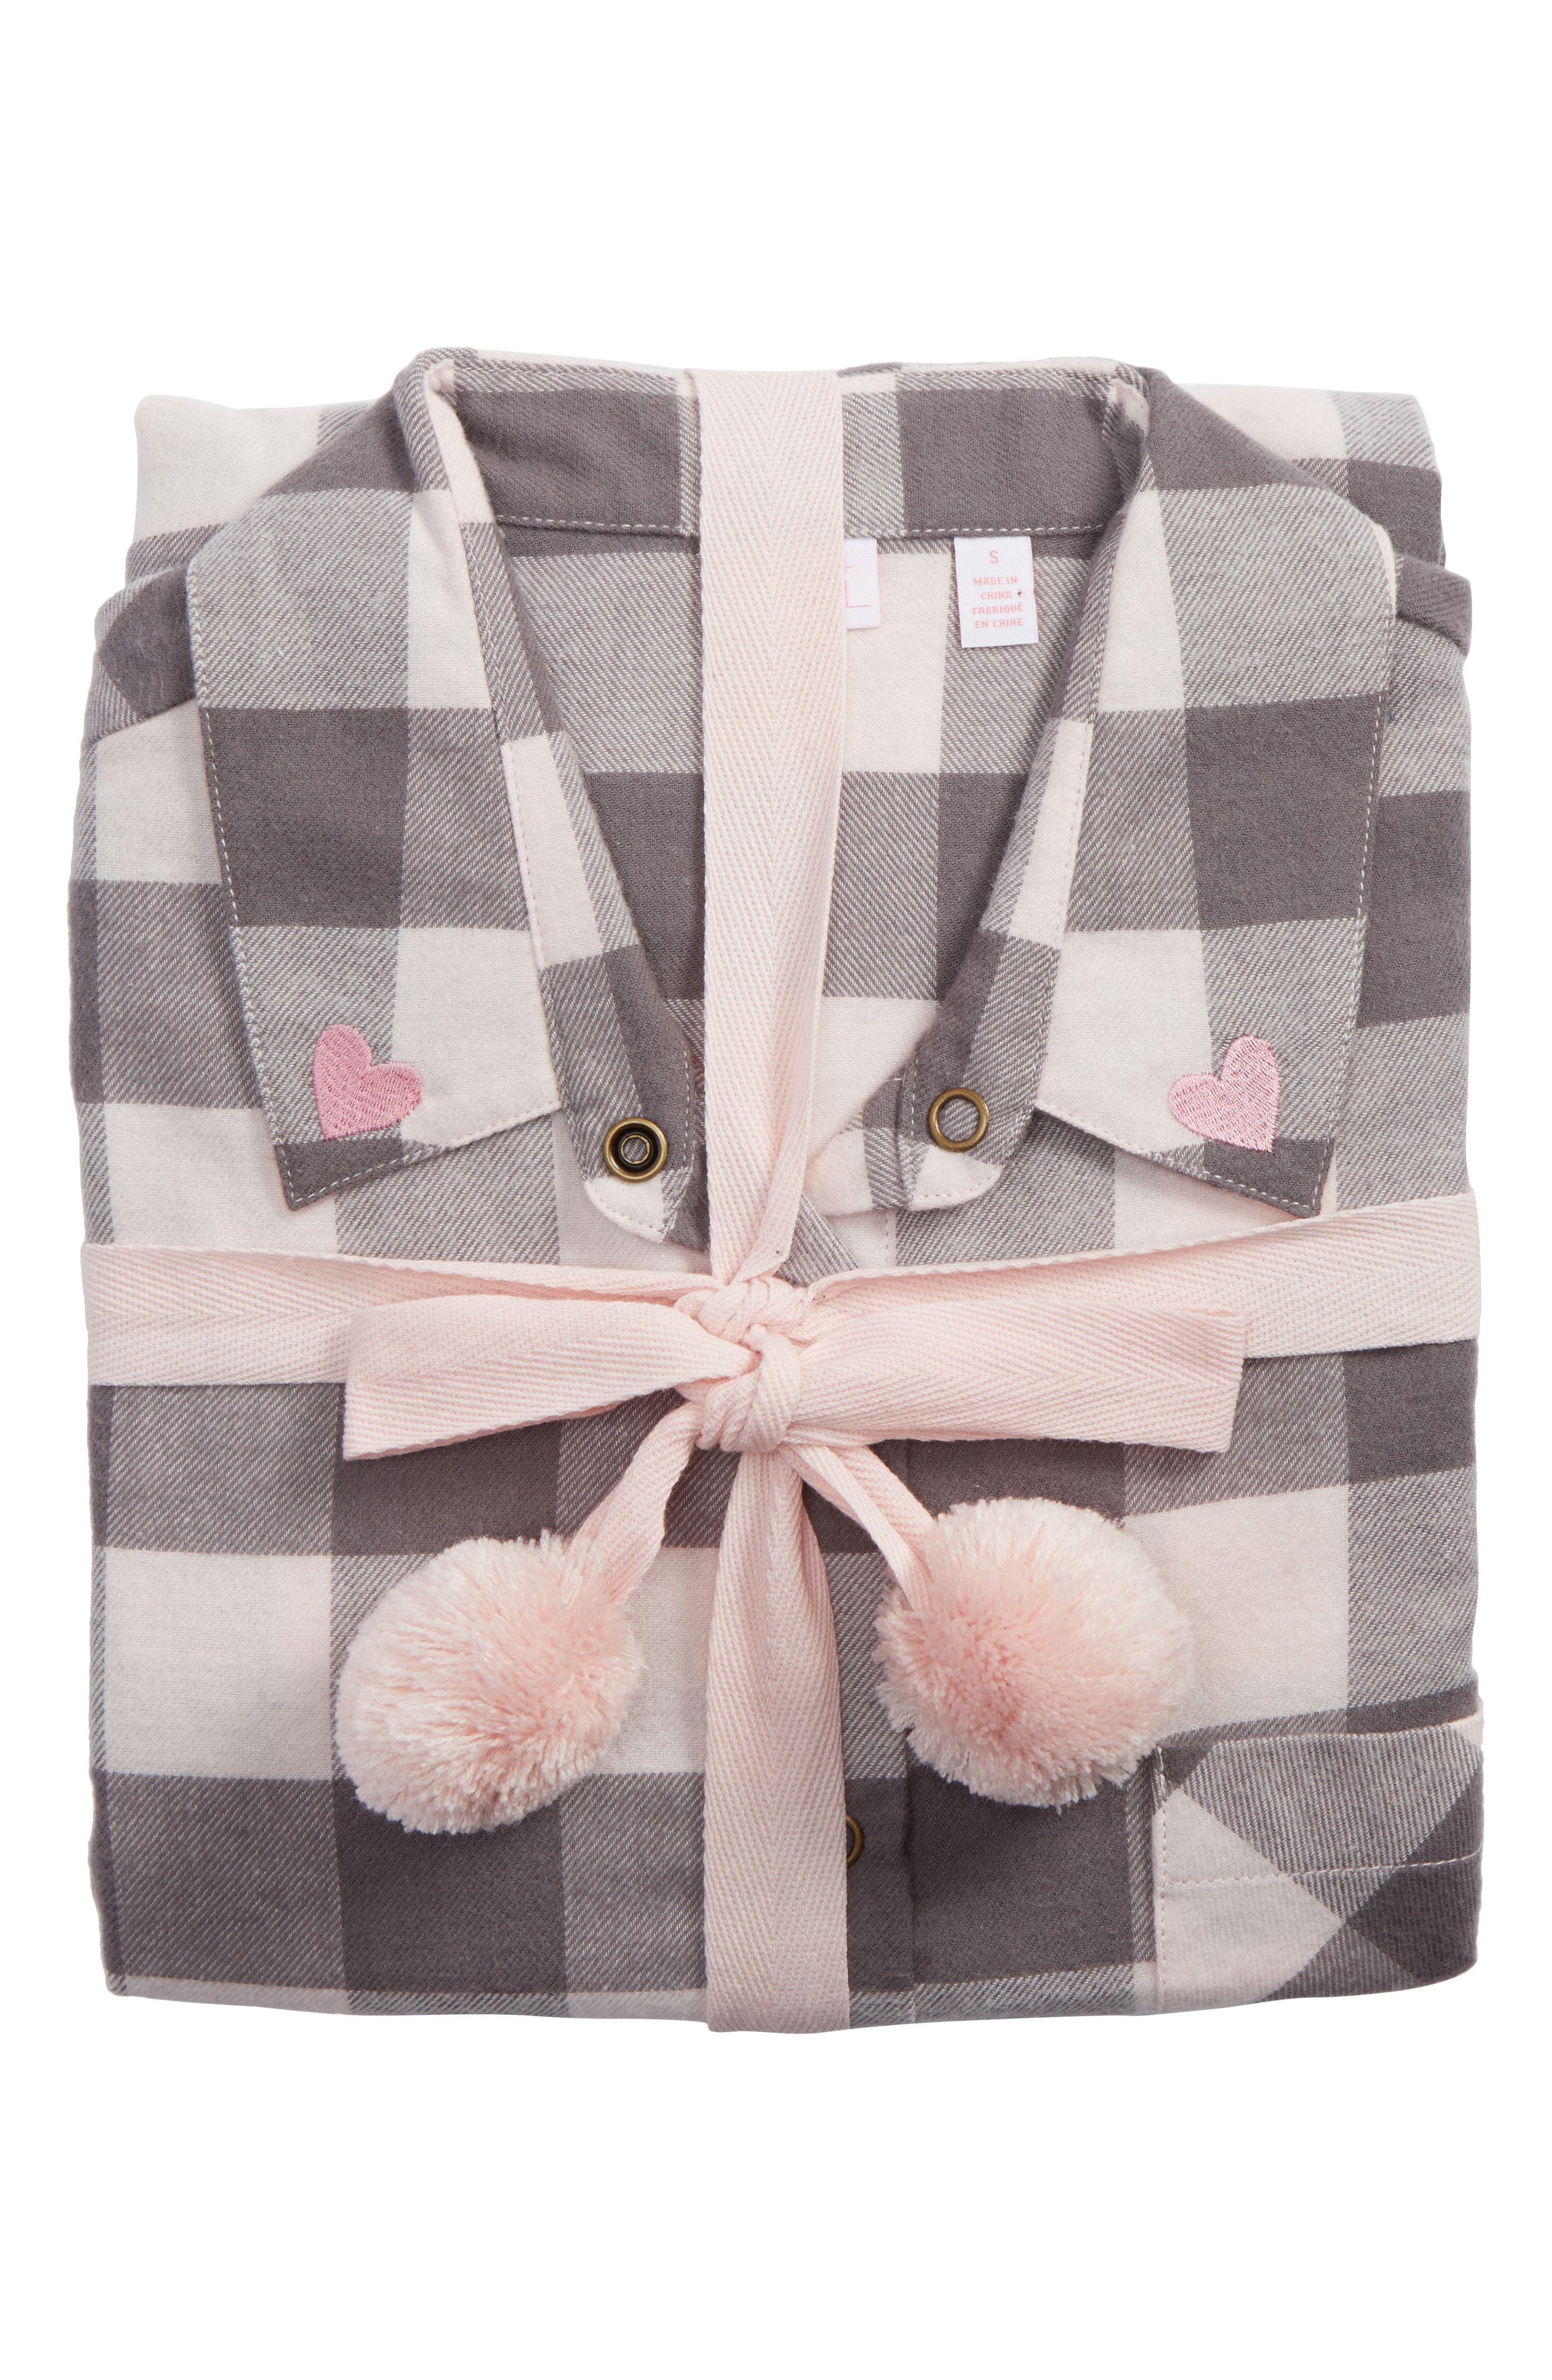 DIANA Make + Model Flannel Girlfriend Pajamas - Grey Buffalo Check Plaid dbd80e1bc